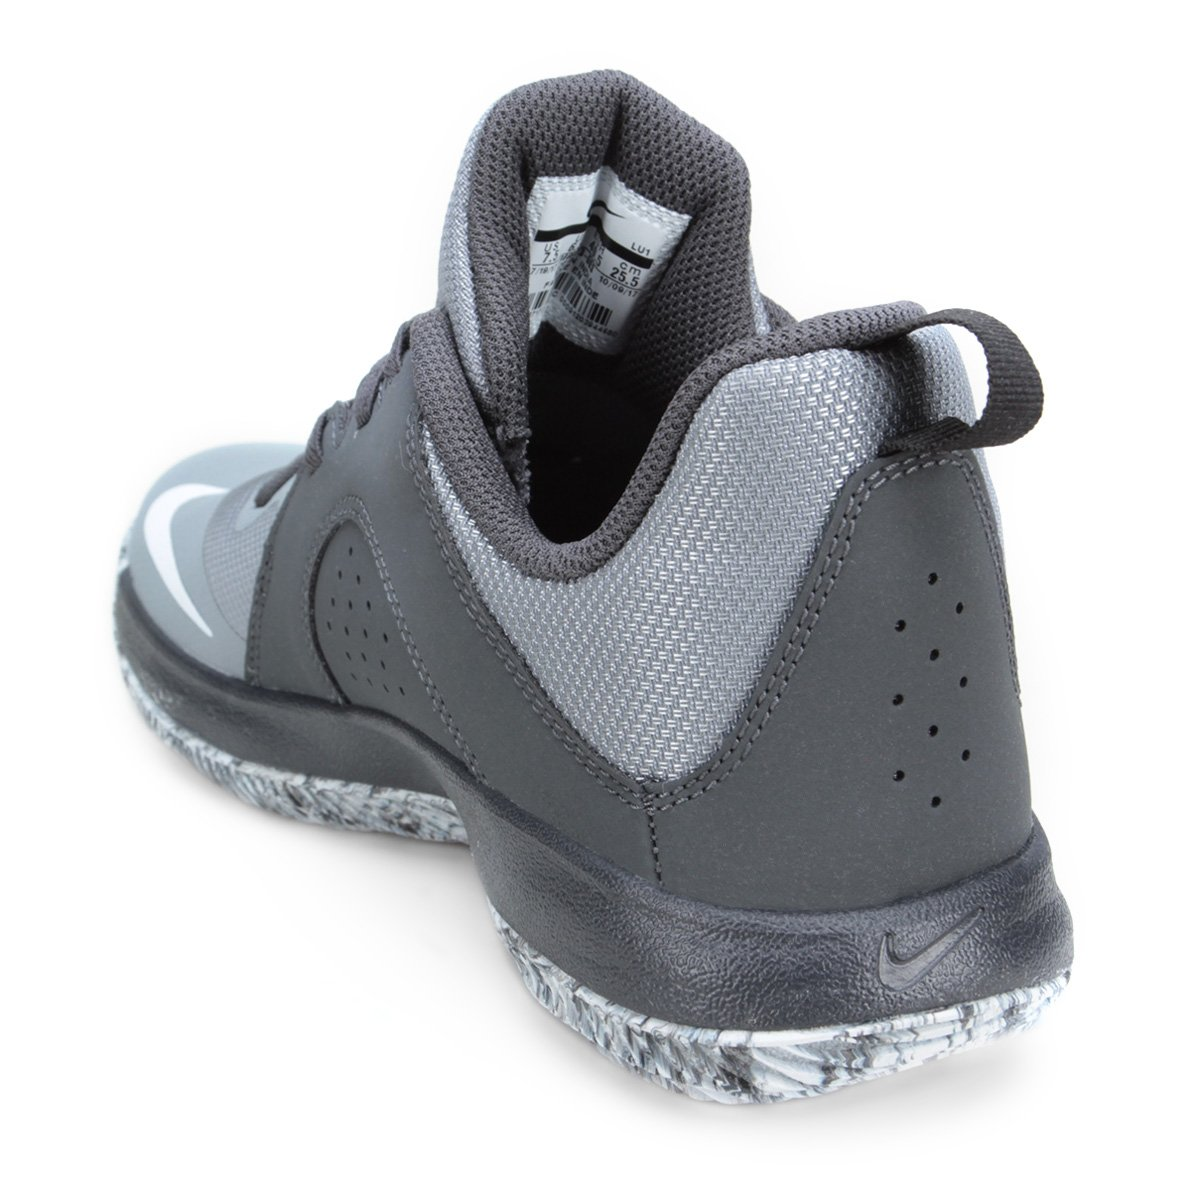 Loja Loja Masculino Nike Low Fly By NBA NBA Tênis Compre Agora xSpq0wFfF 4455cfbaded12